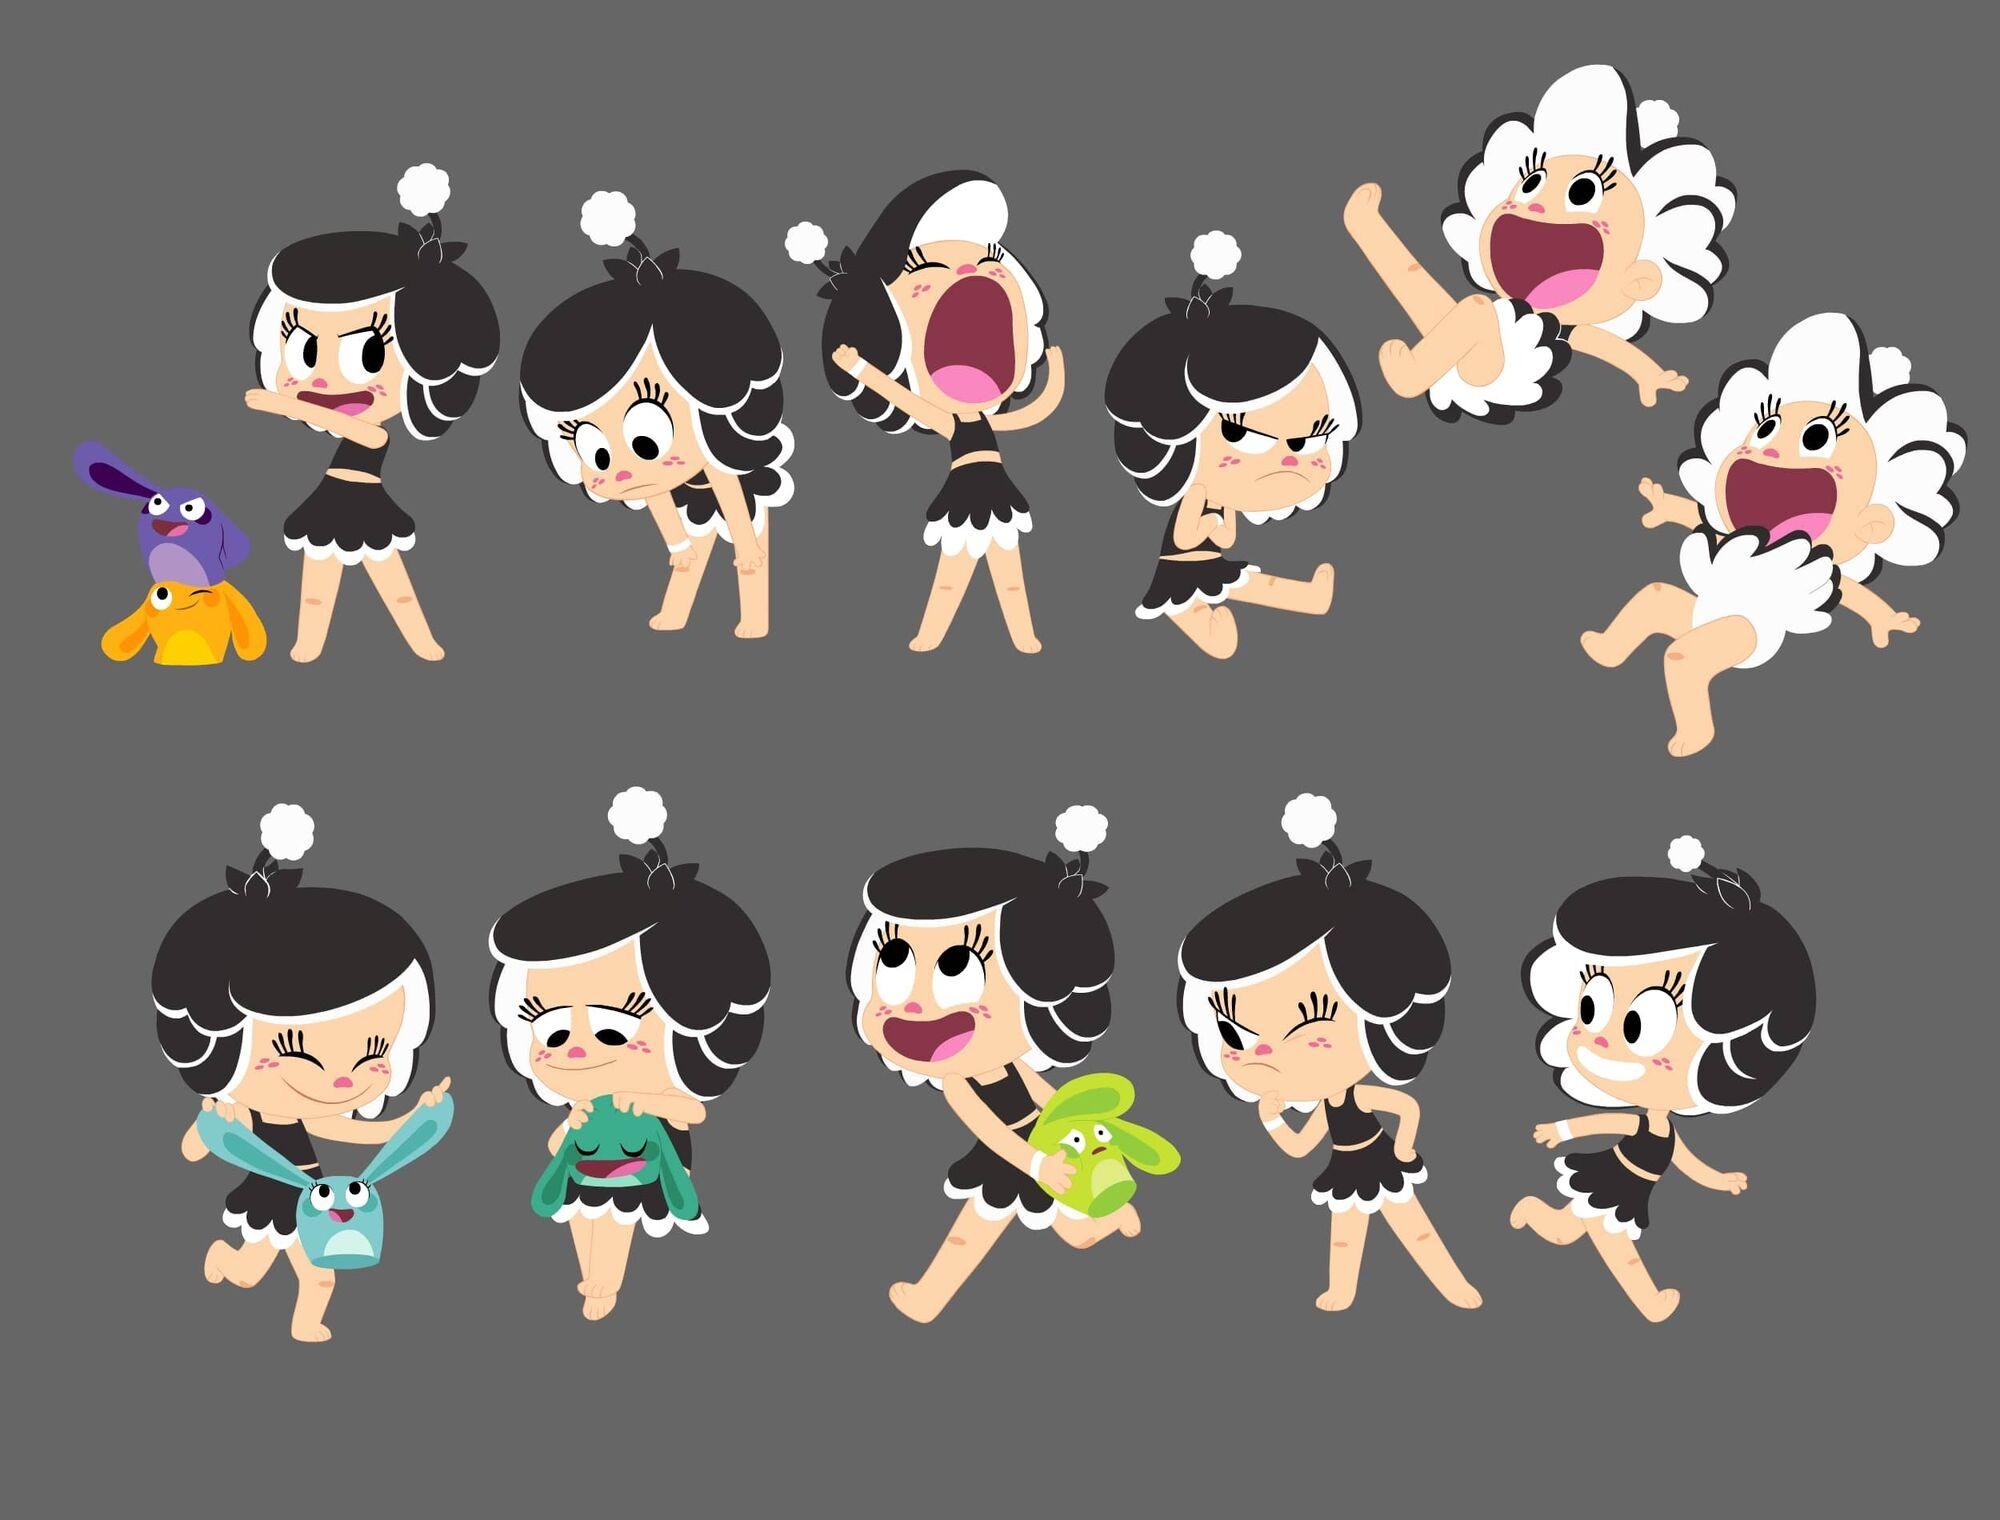 Hide And Seek Recovery >> Image - Hanazuki Poses Sheet.jpg | Hanazuki Full of